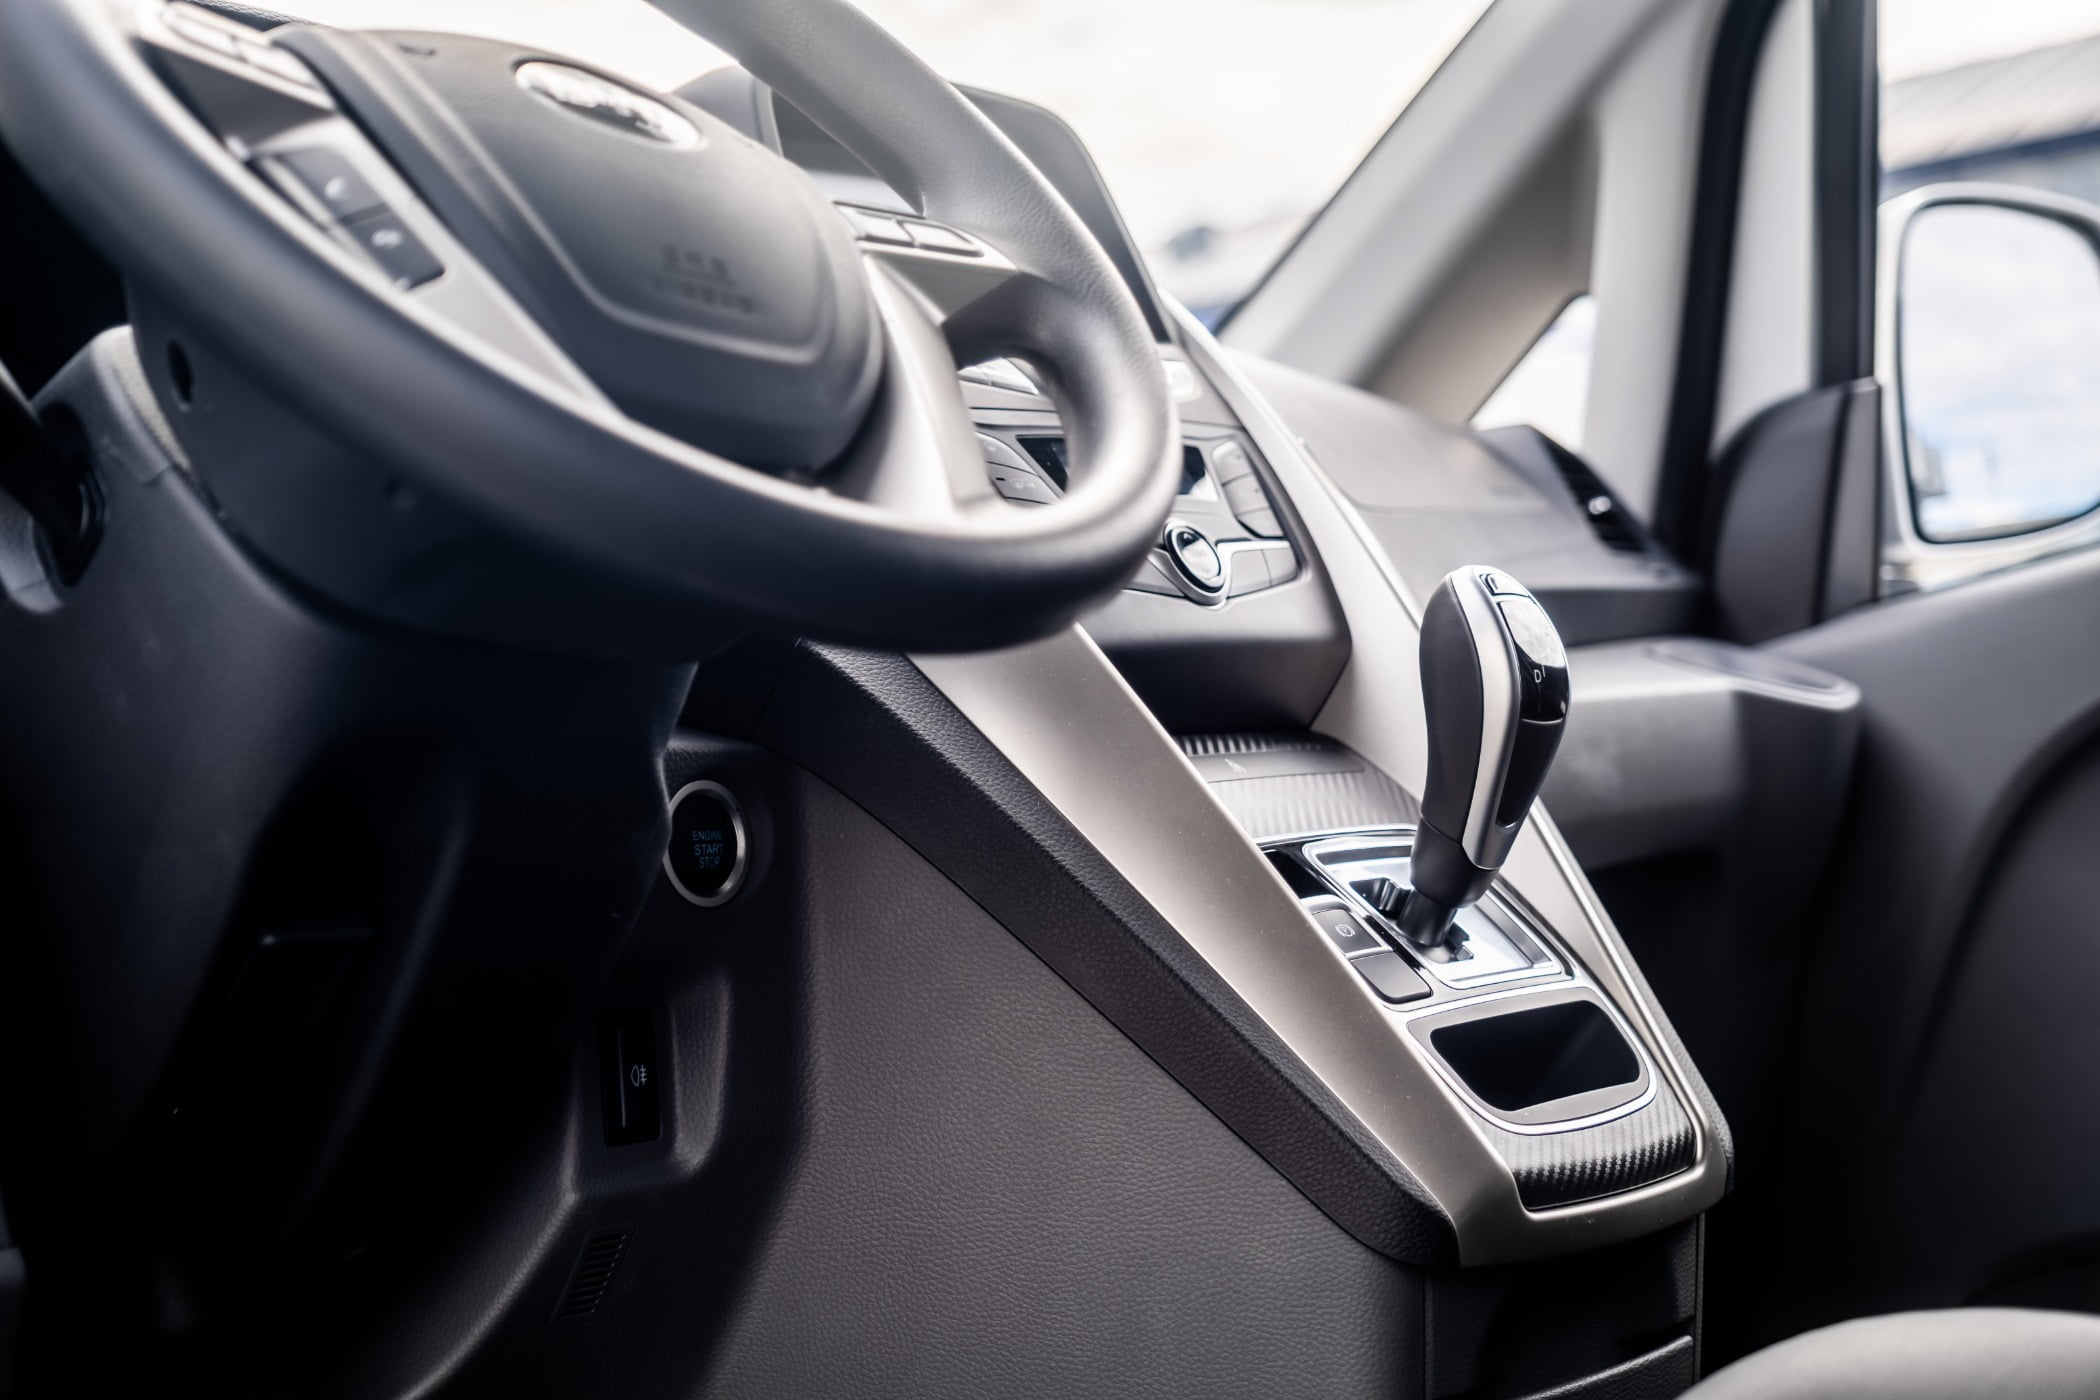 Car seat cover, Motor vehicle, Automotive design, Steering wheel, Gear shift